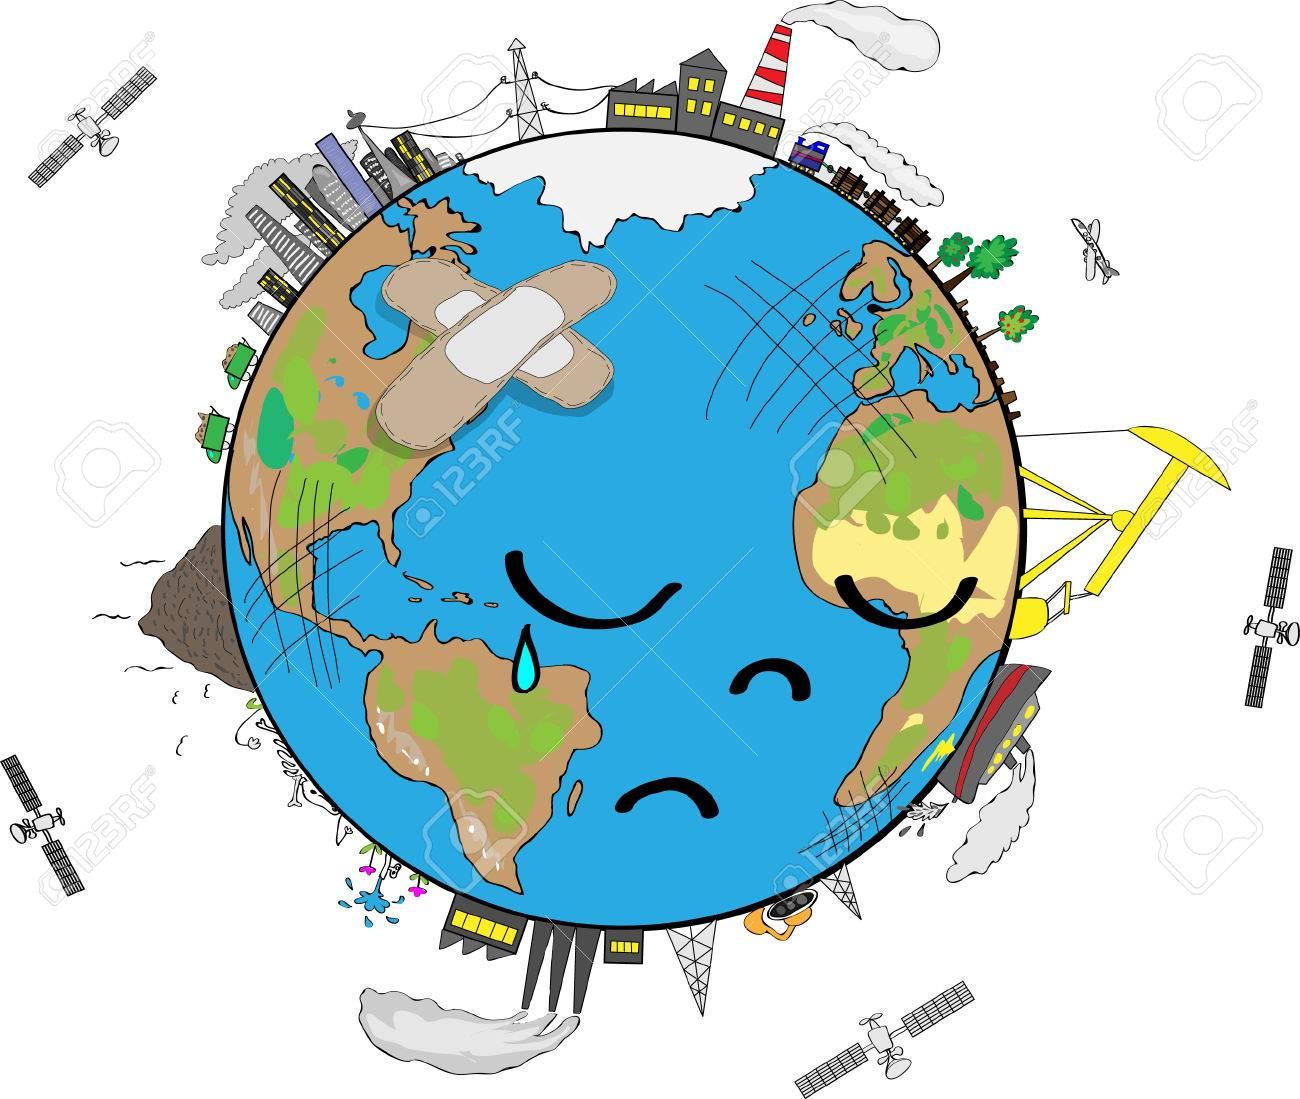 sad planet earth cartoon royalty free cliparts vectors and stock rh 123rf com cartoon of the earth cartoon of the earth